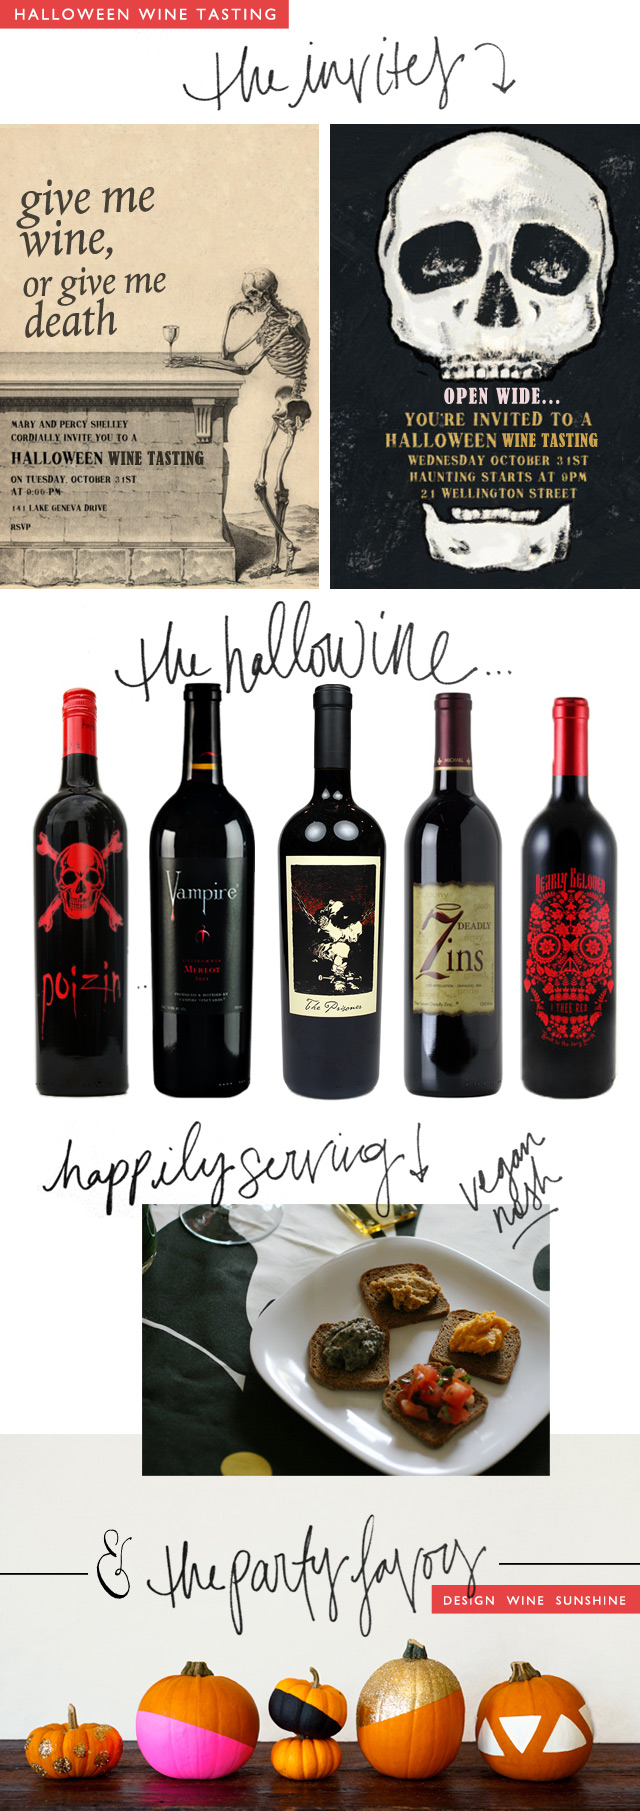 design-wine-sunshine-halloween-wine-tasting